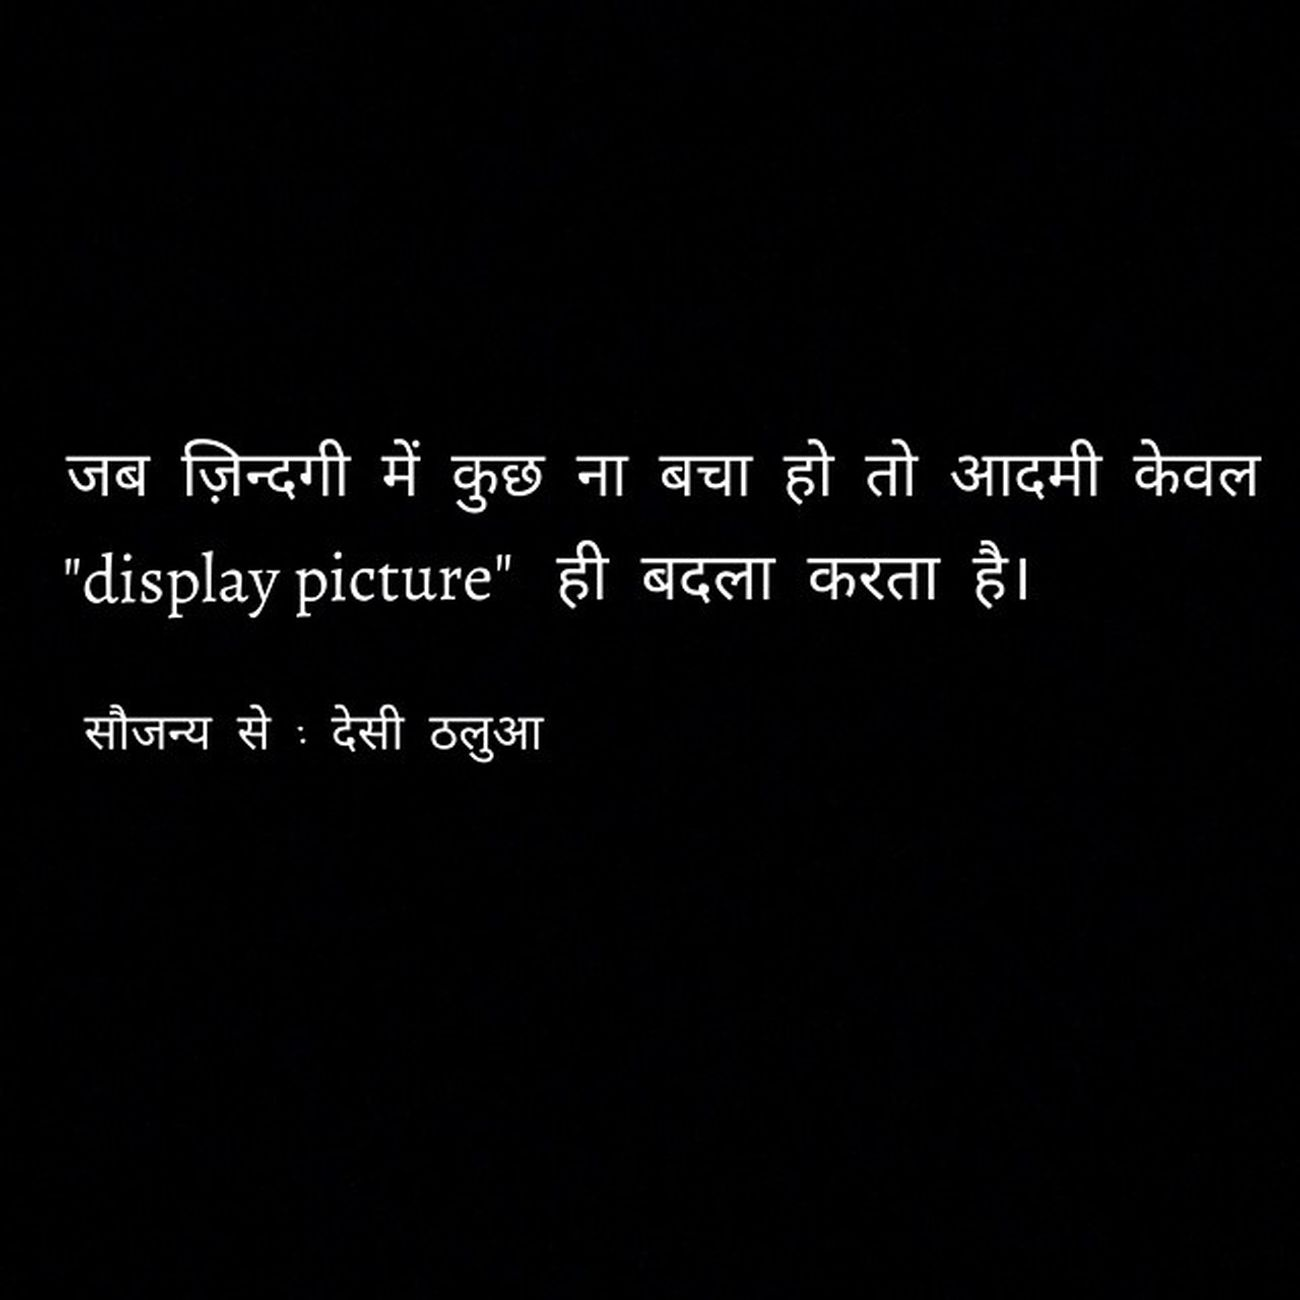 Gyaanvaani. Desi Desithalua Dp Hindi Swag Bakchodi